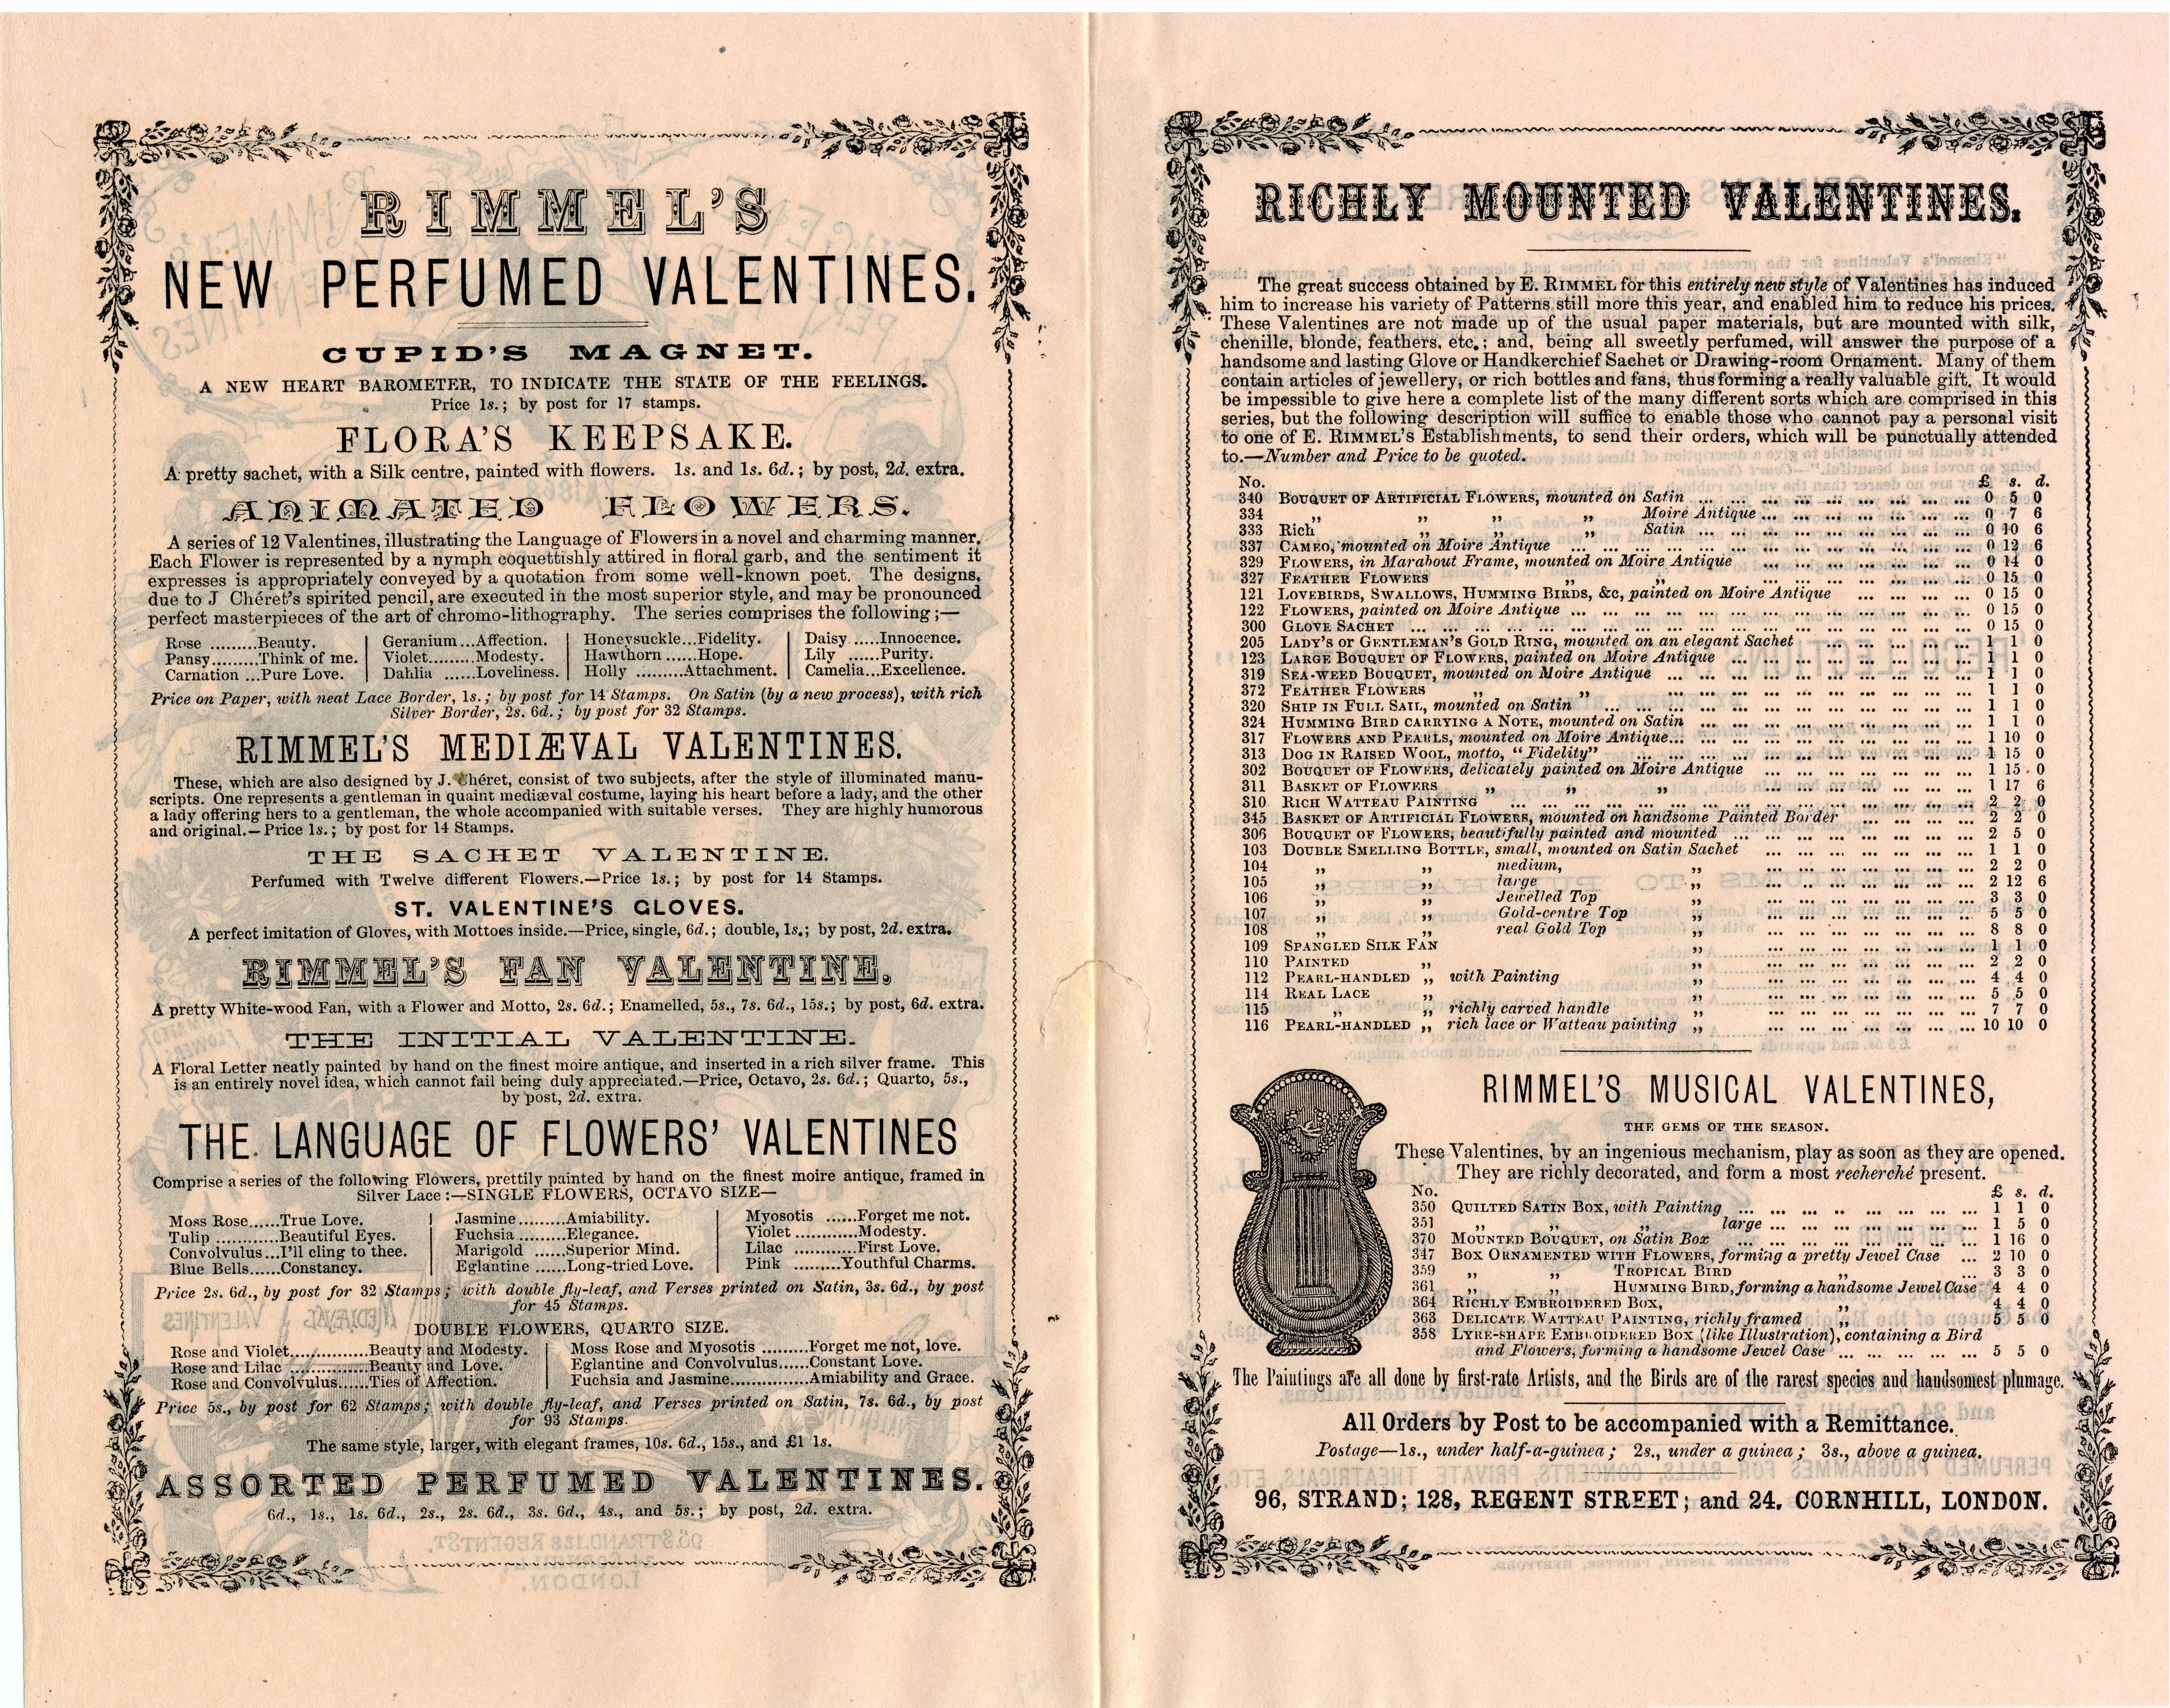 Insert 1867 openinglow.